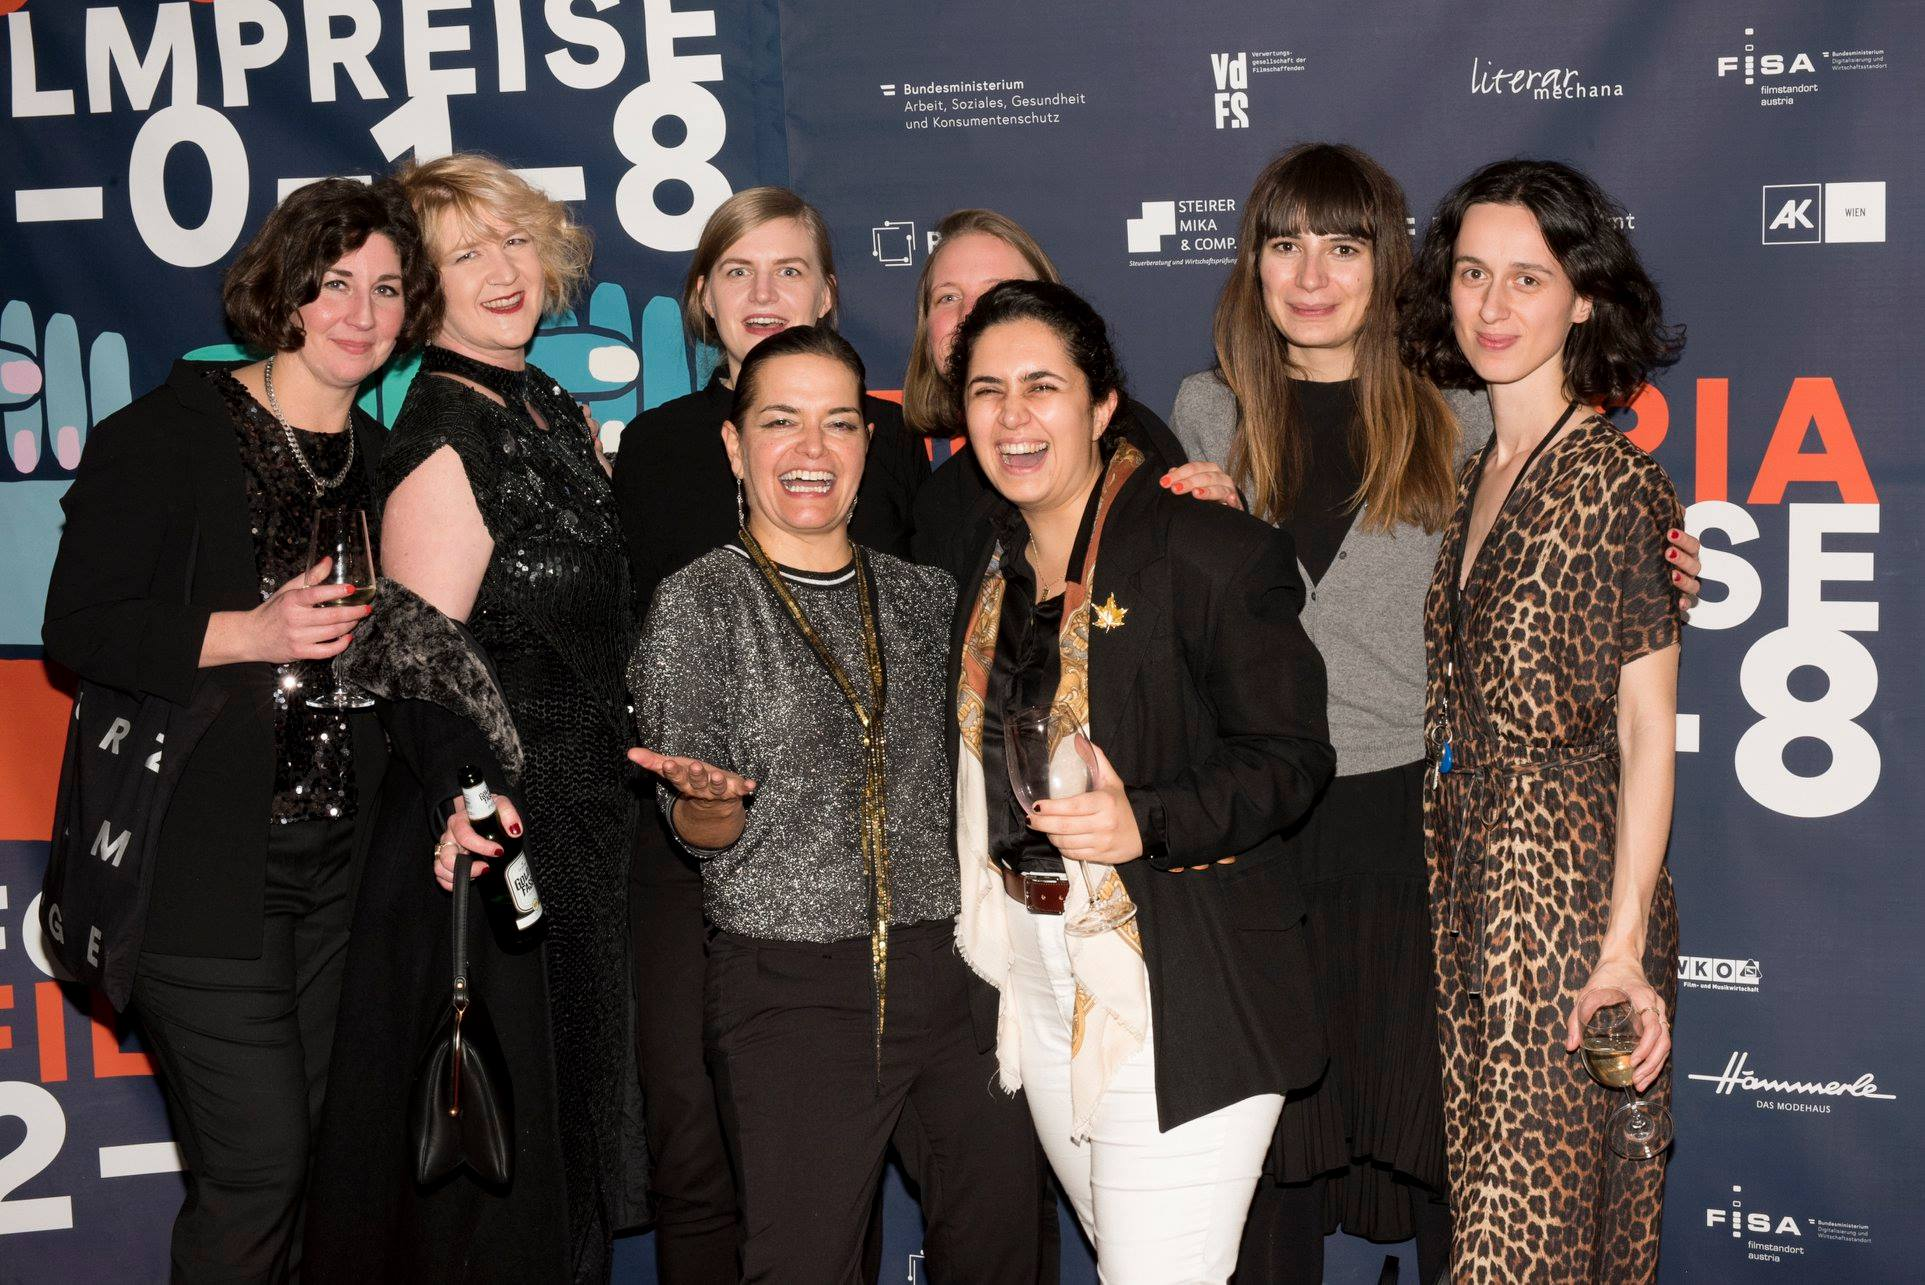 Katrina Daschner, Denice Bourbon, Veronika Adamski, Sarah Podbelsek, Jonida Laci, Hicran Ergen mit Preisträgerin Sabine Marten